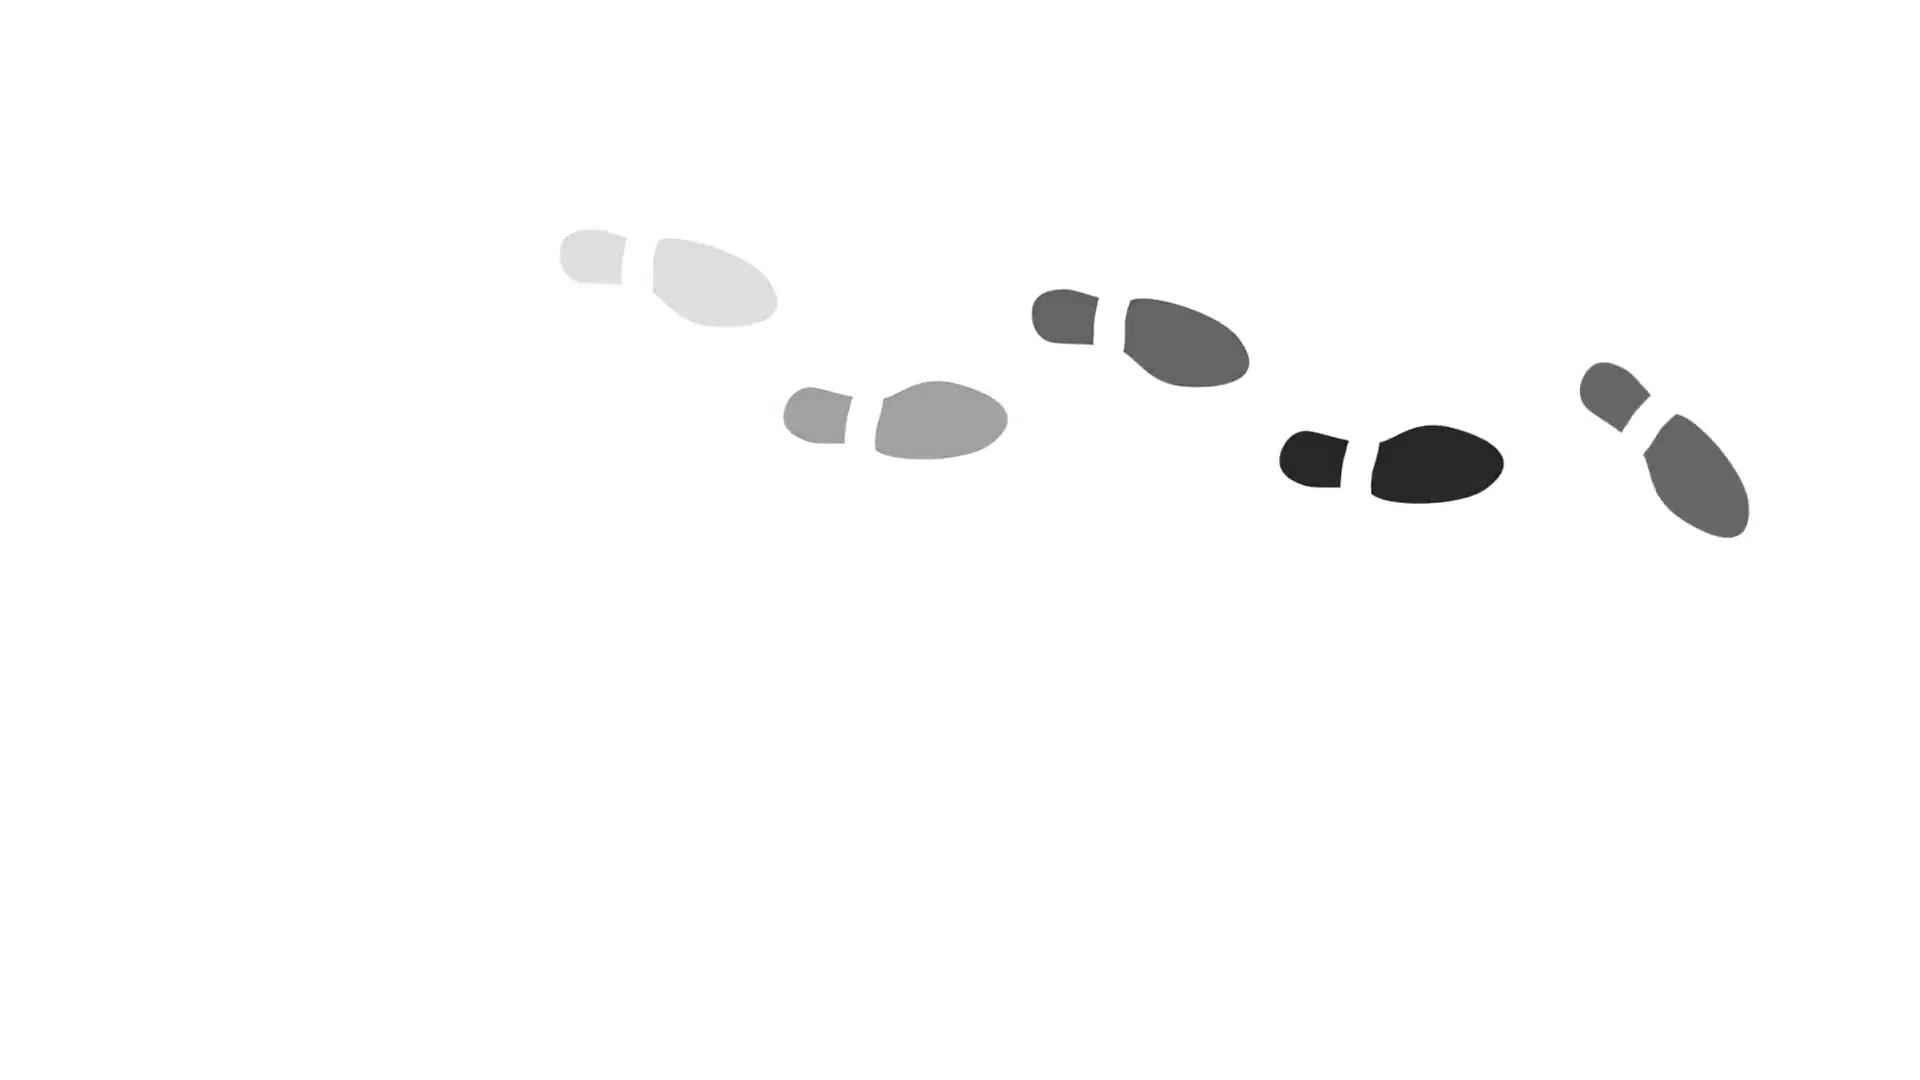 Footprints Walking Animation Motion Background.